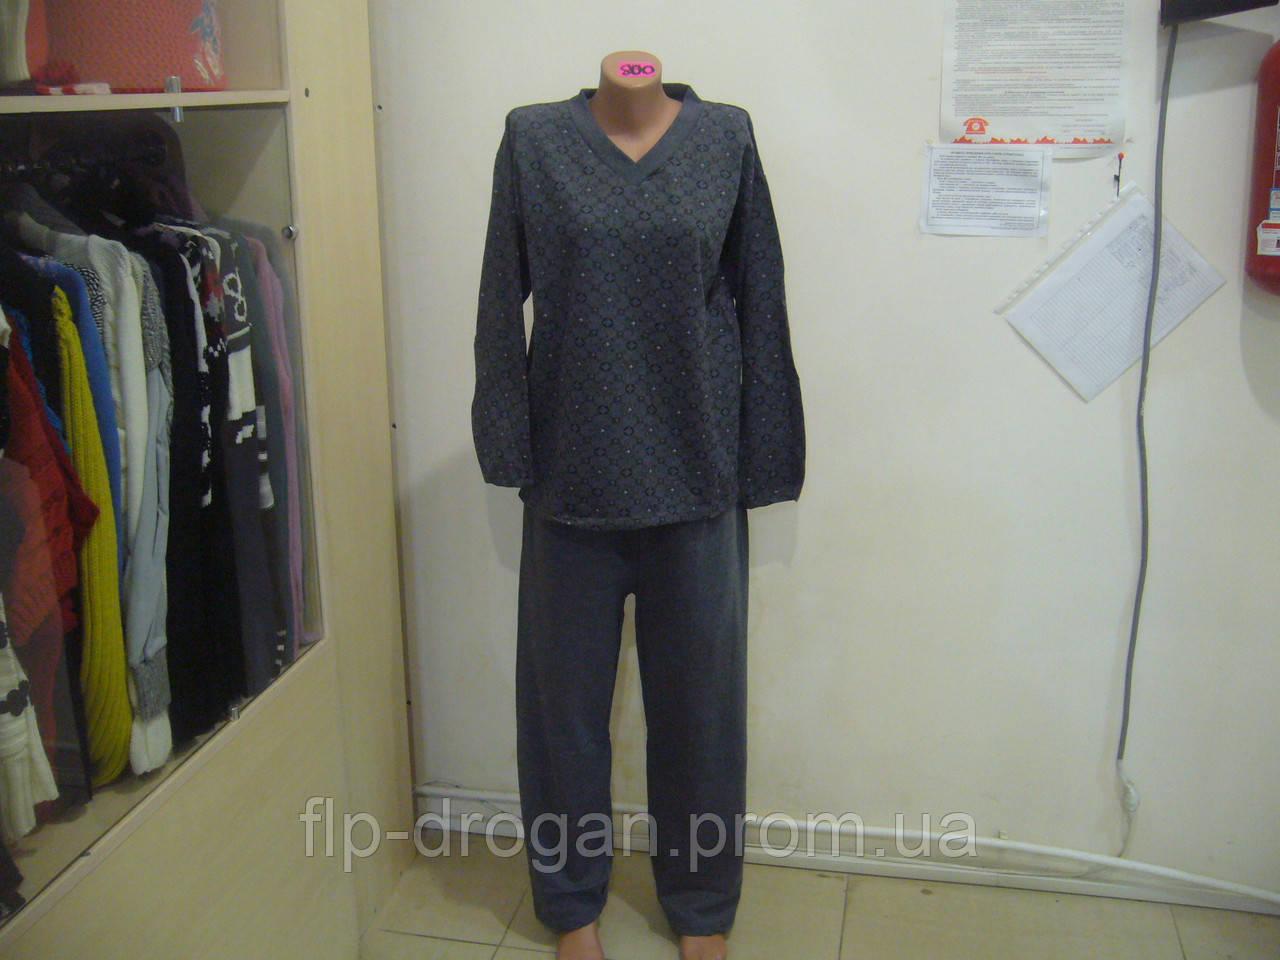 939b1f899e8a Пижама мужская хлопок на байке новая турция m l xl xxl: продажа ...